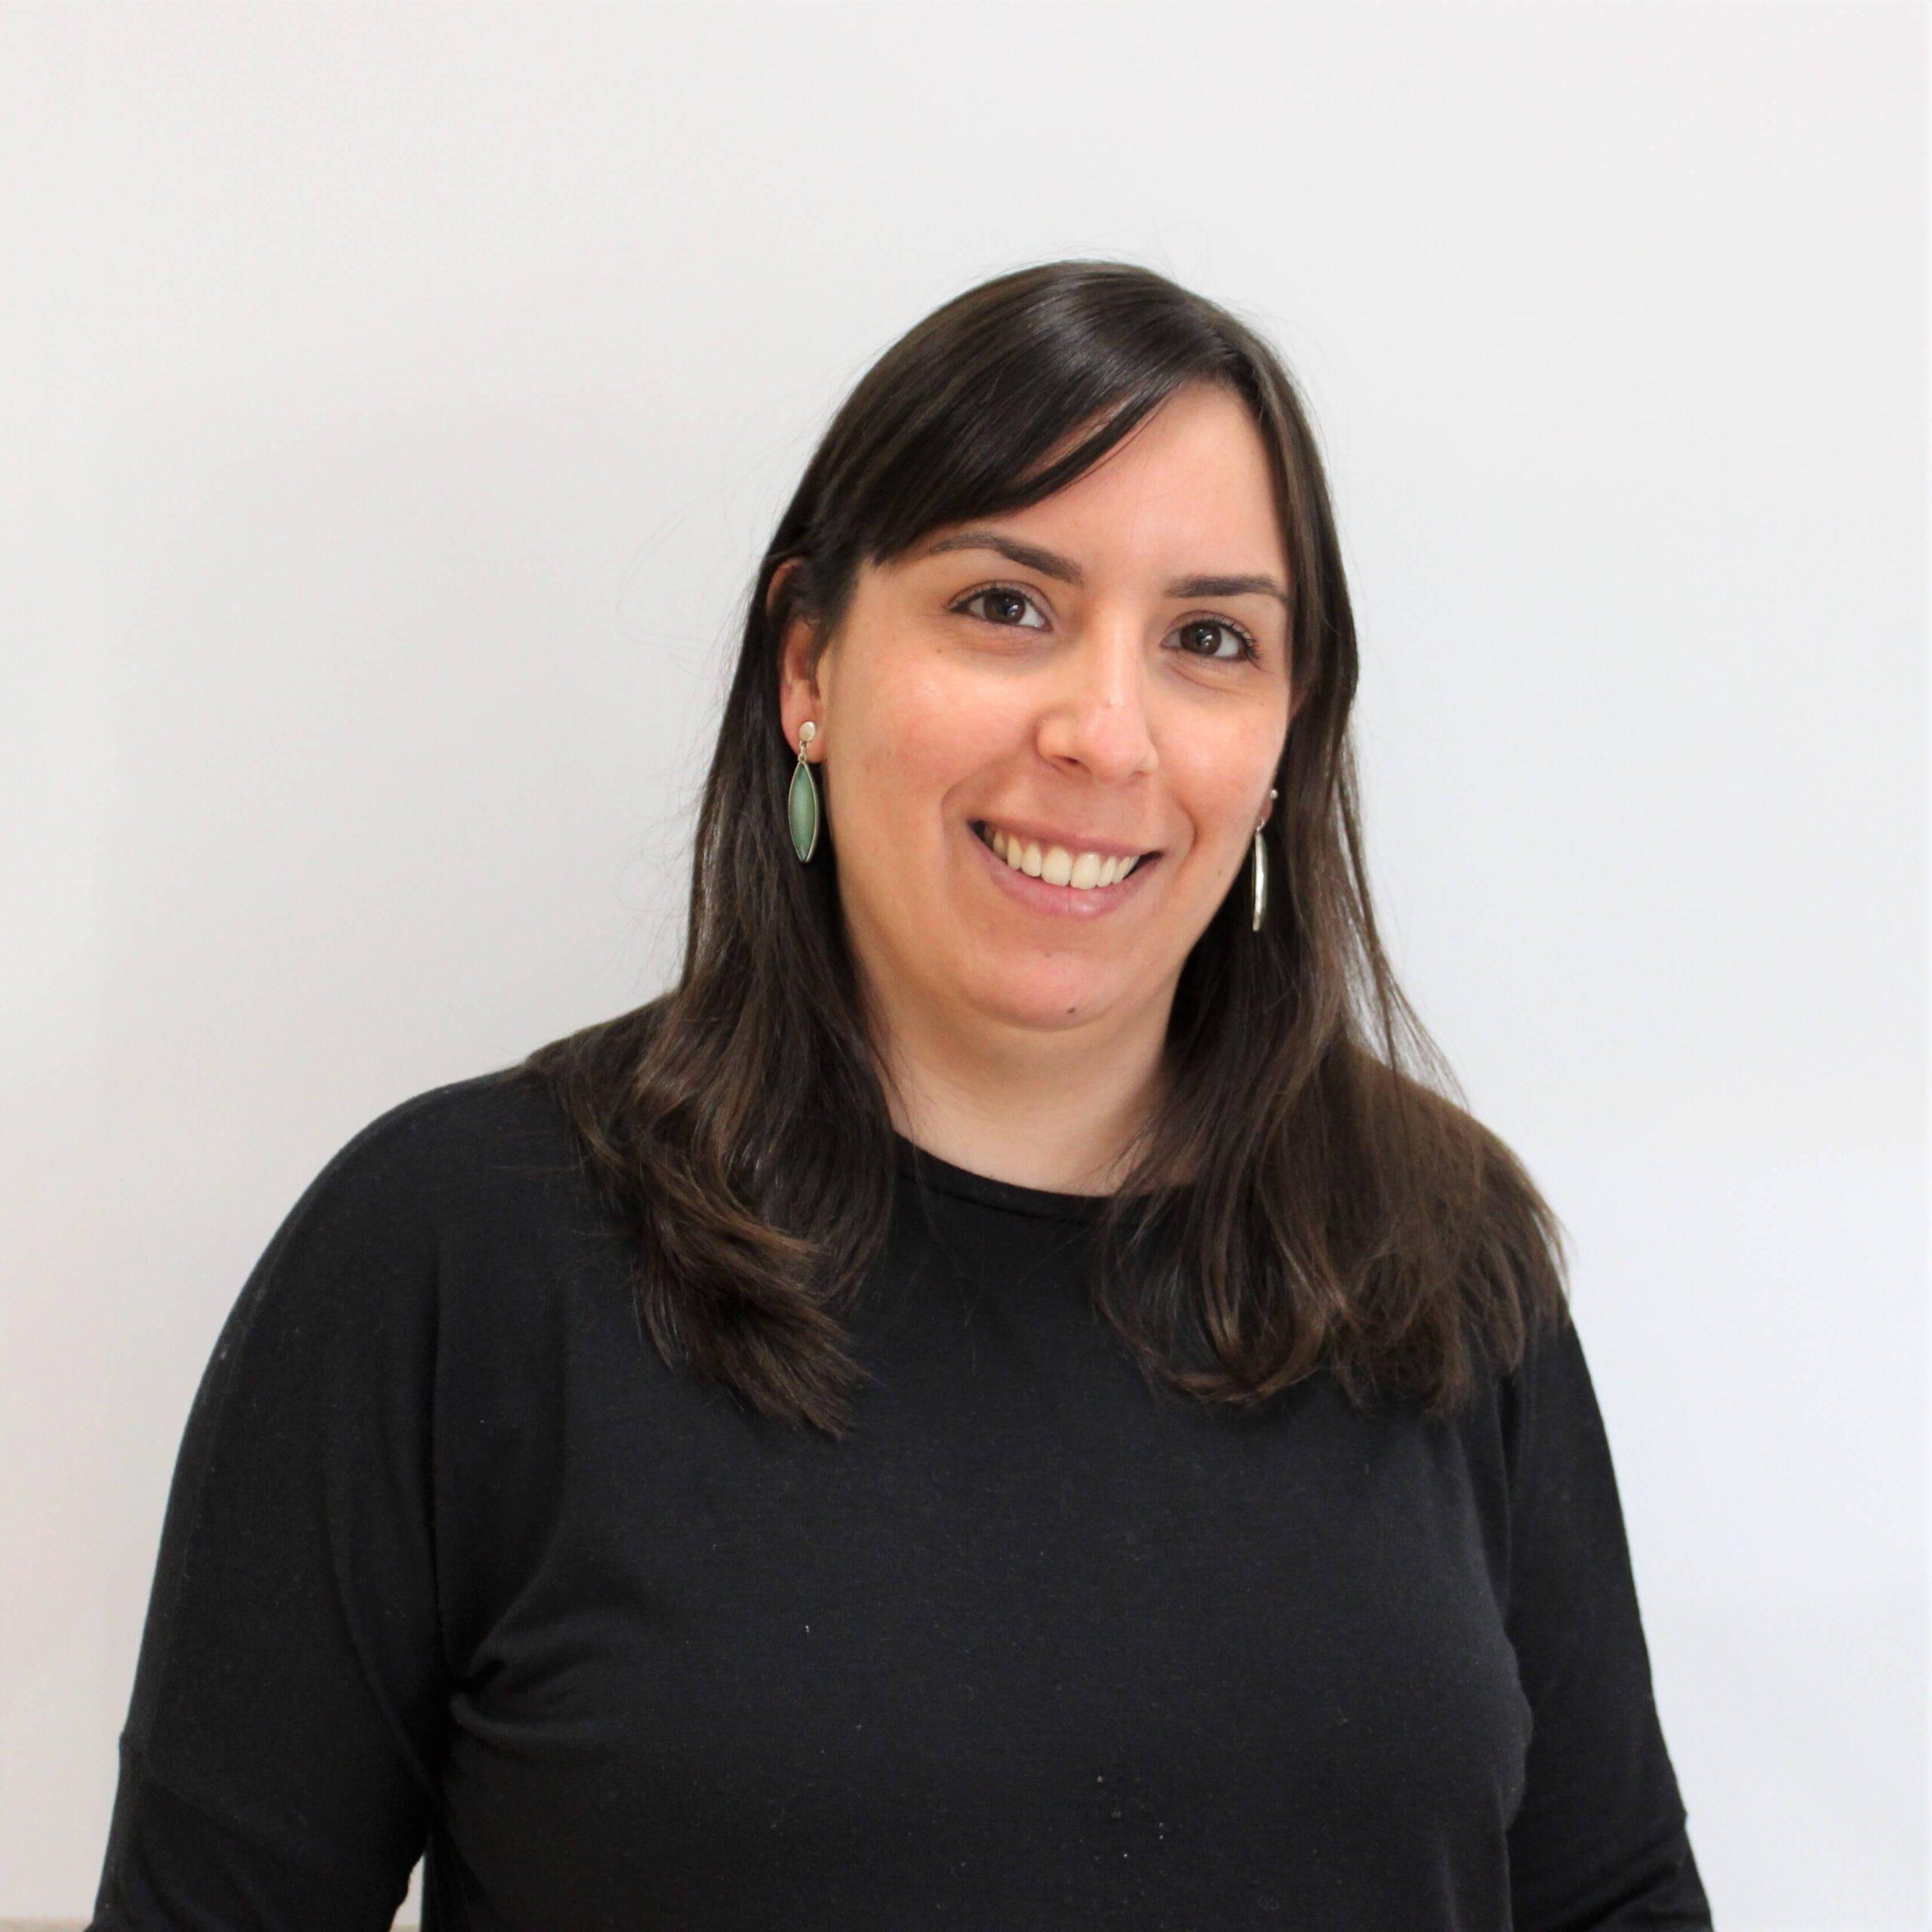 Ester Blanco Arranz